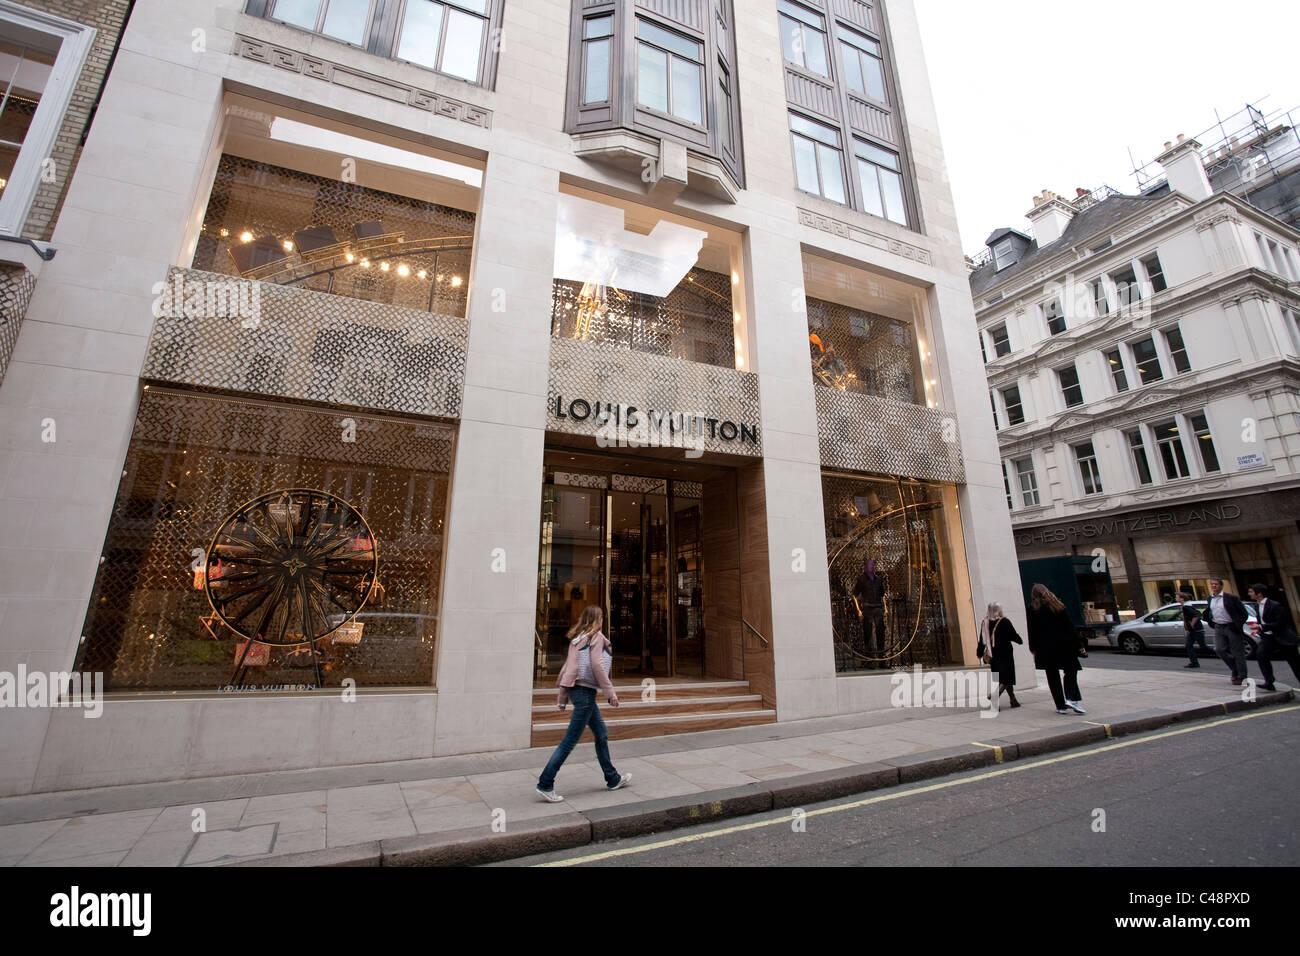 Louis Vuitton flagship store in Bond Street, Central ...